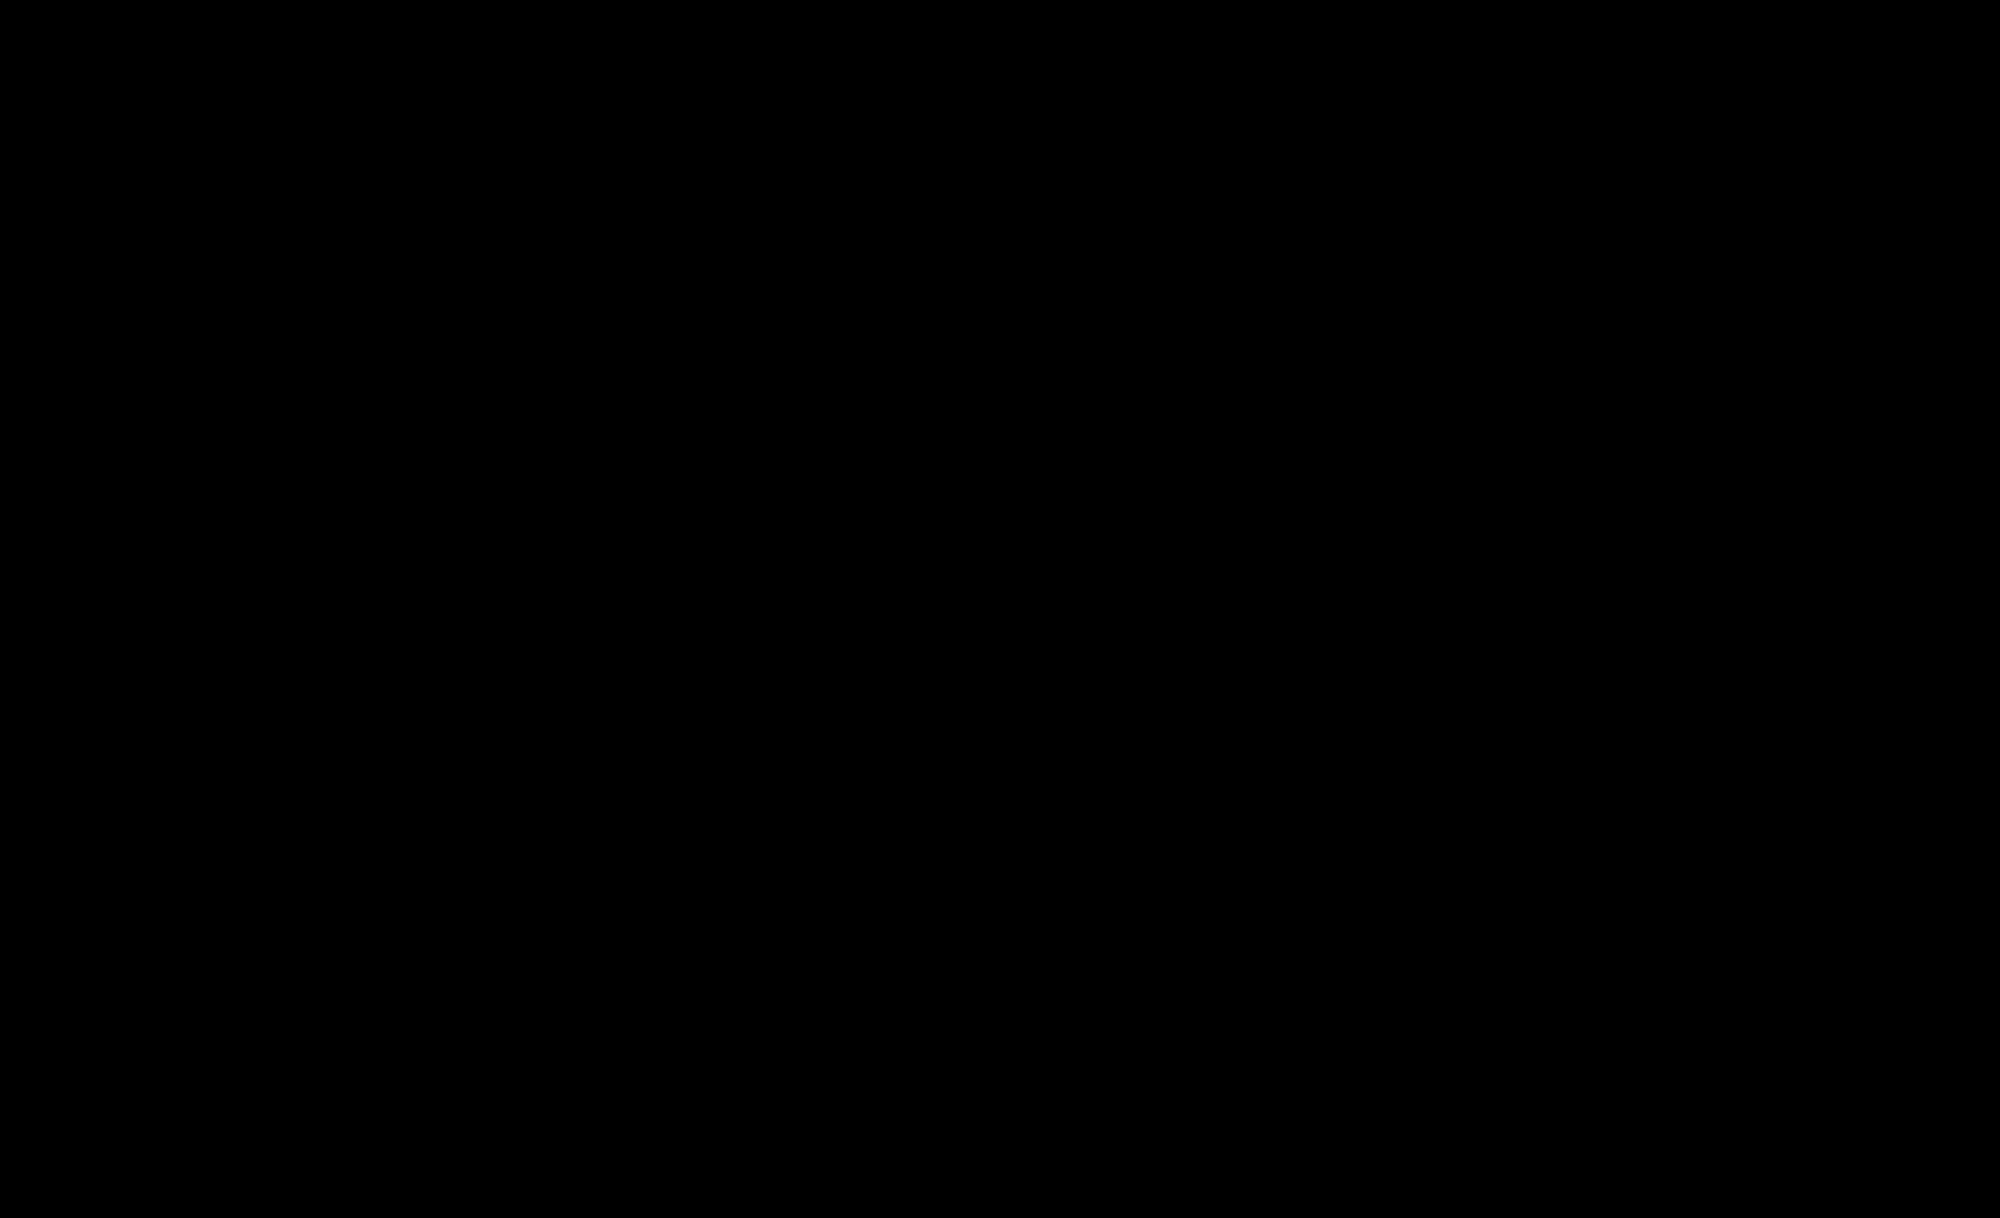 Catastrophe -logo-black.png